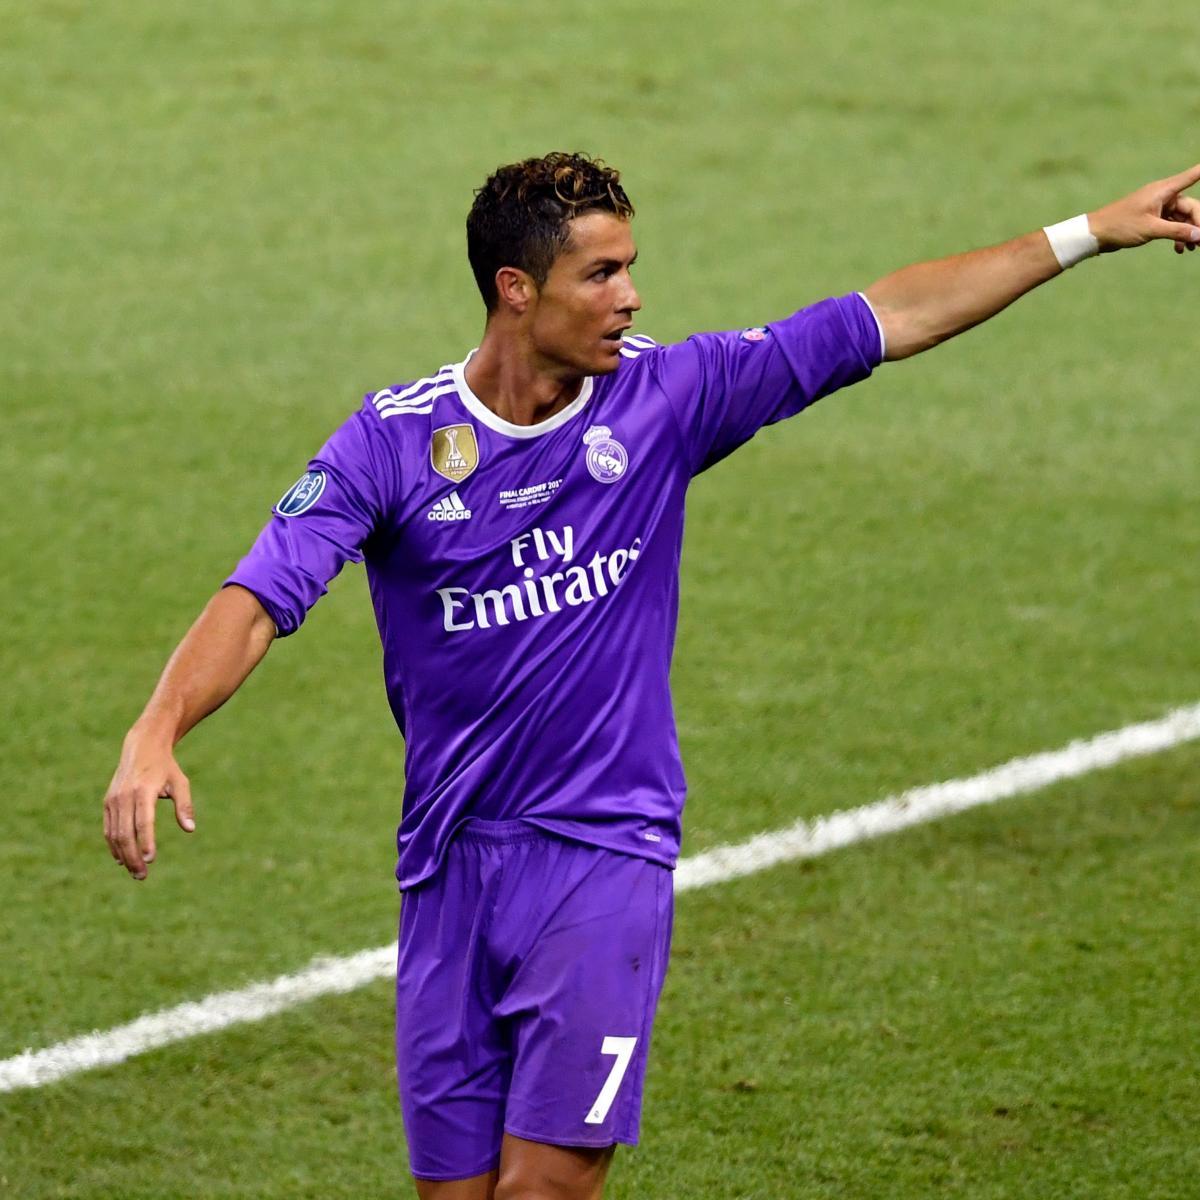 Cristiano Ronaldo S 4 Goals Lead Real Madrid To Win Vs: Cristiano Ronaldo Scores 600th Career Goal For Club And